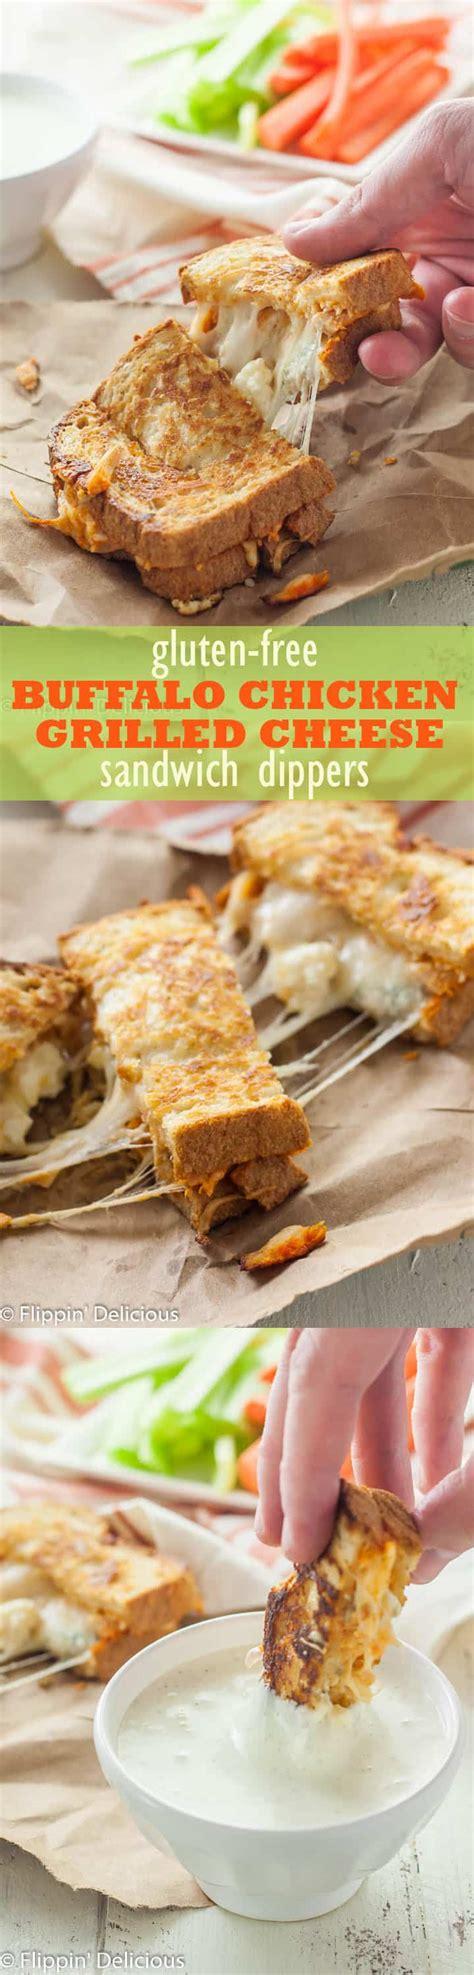 Gluten Free Buffalo Chicken Grilled Cheese Sandwich Dippers